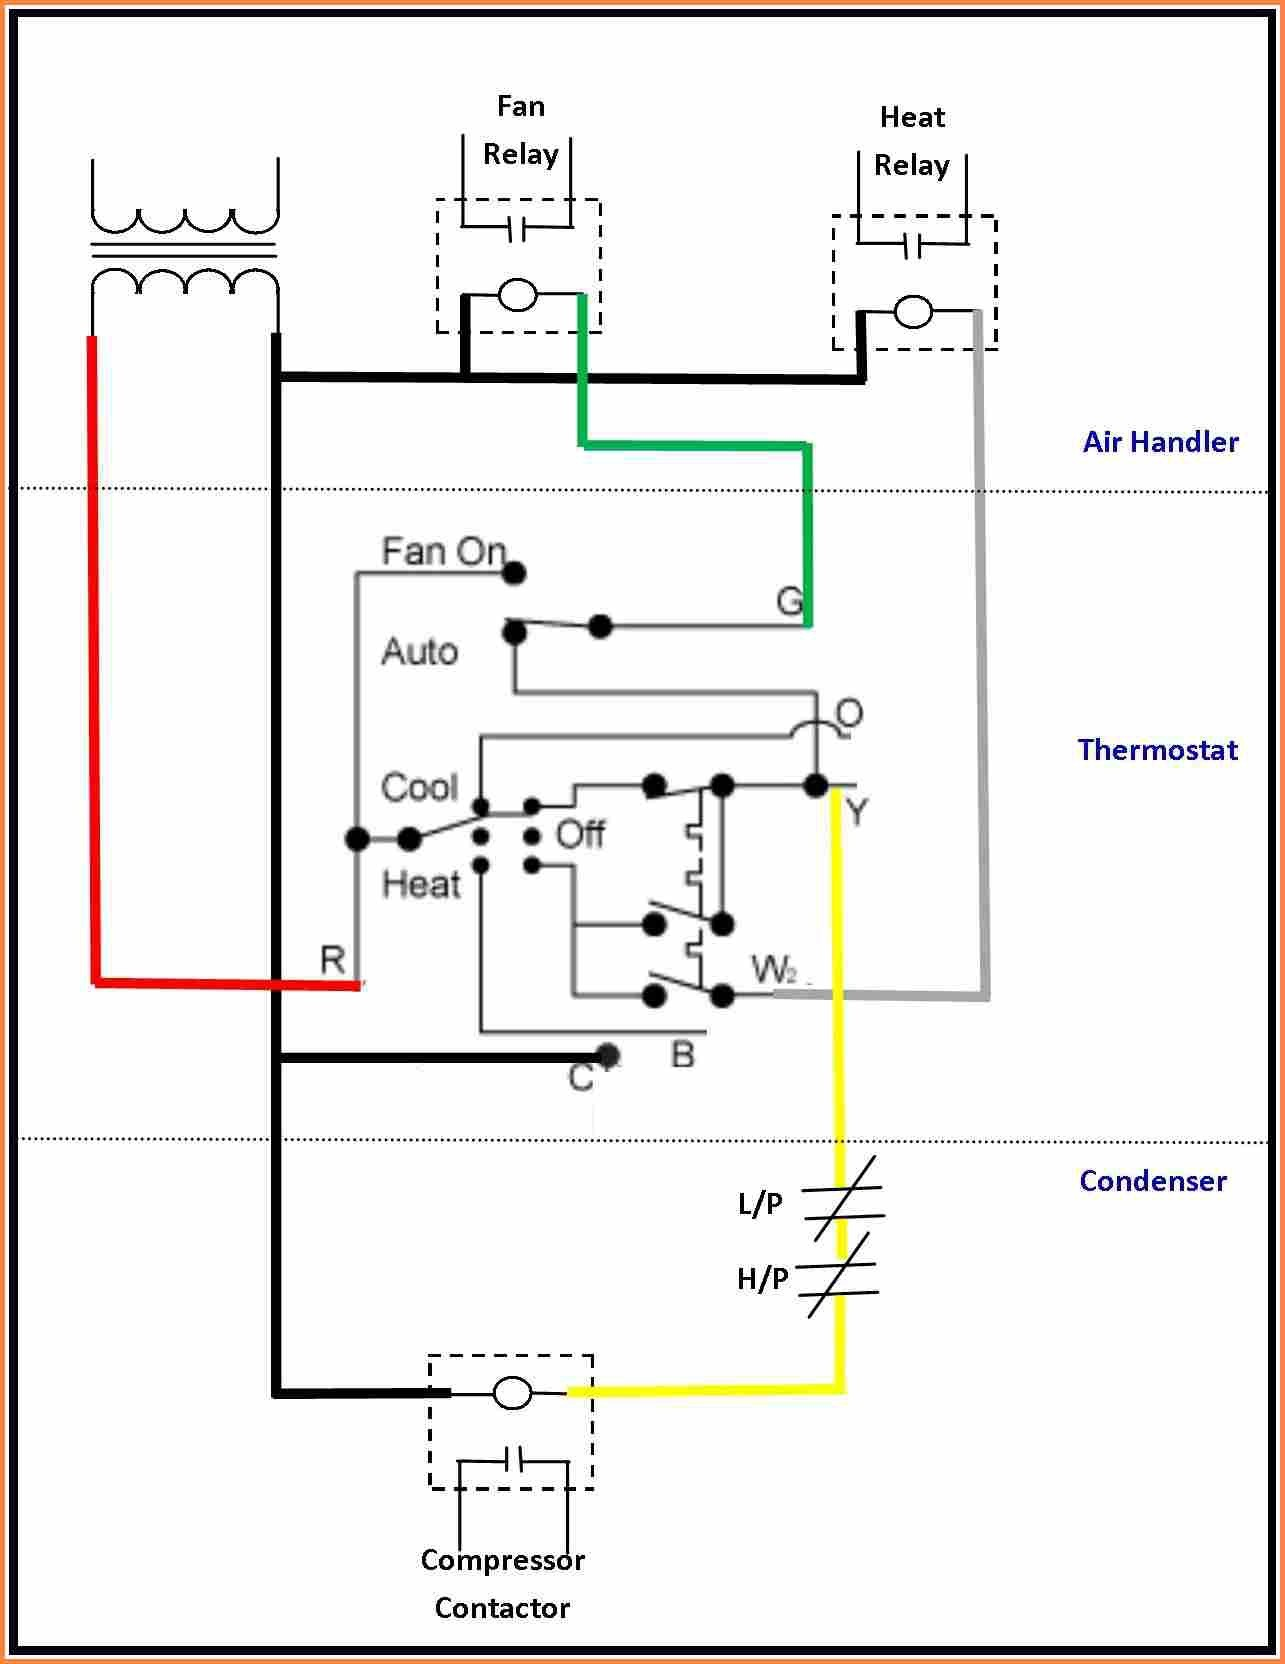 goodman wiring diagram air conditioner 2004 kia sedona fuel pump conditioning thermostat luxury